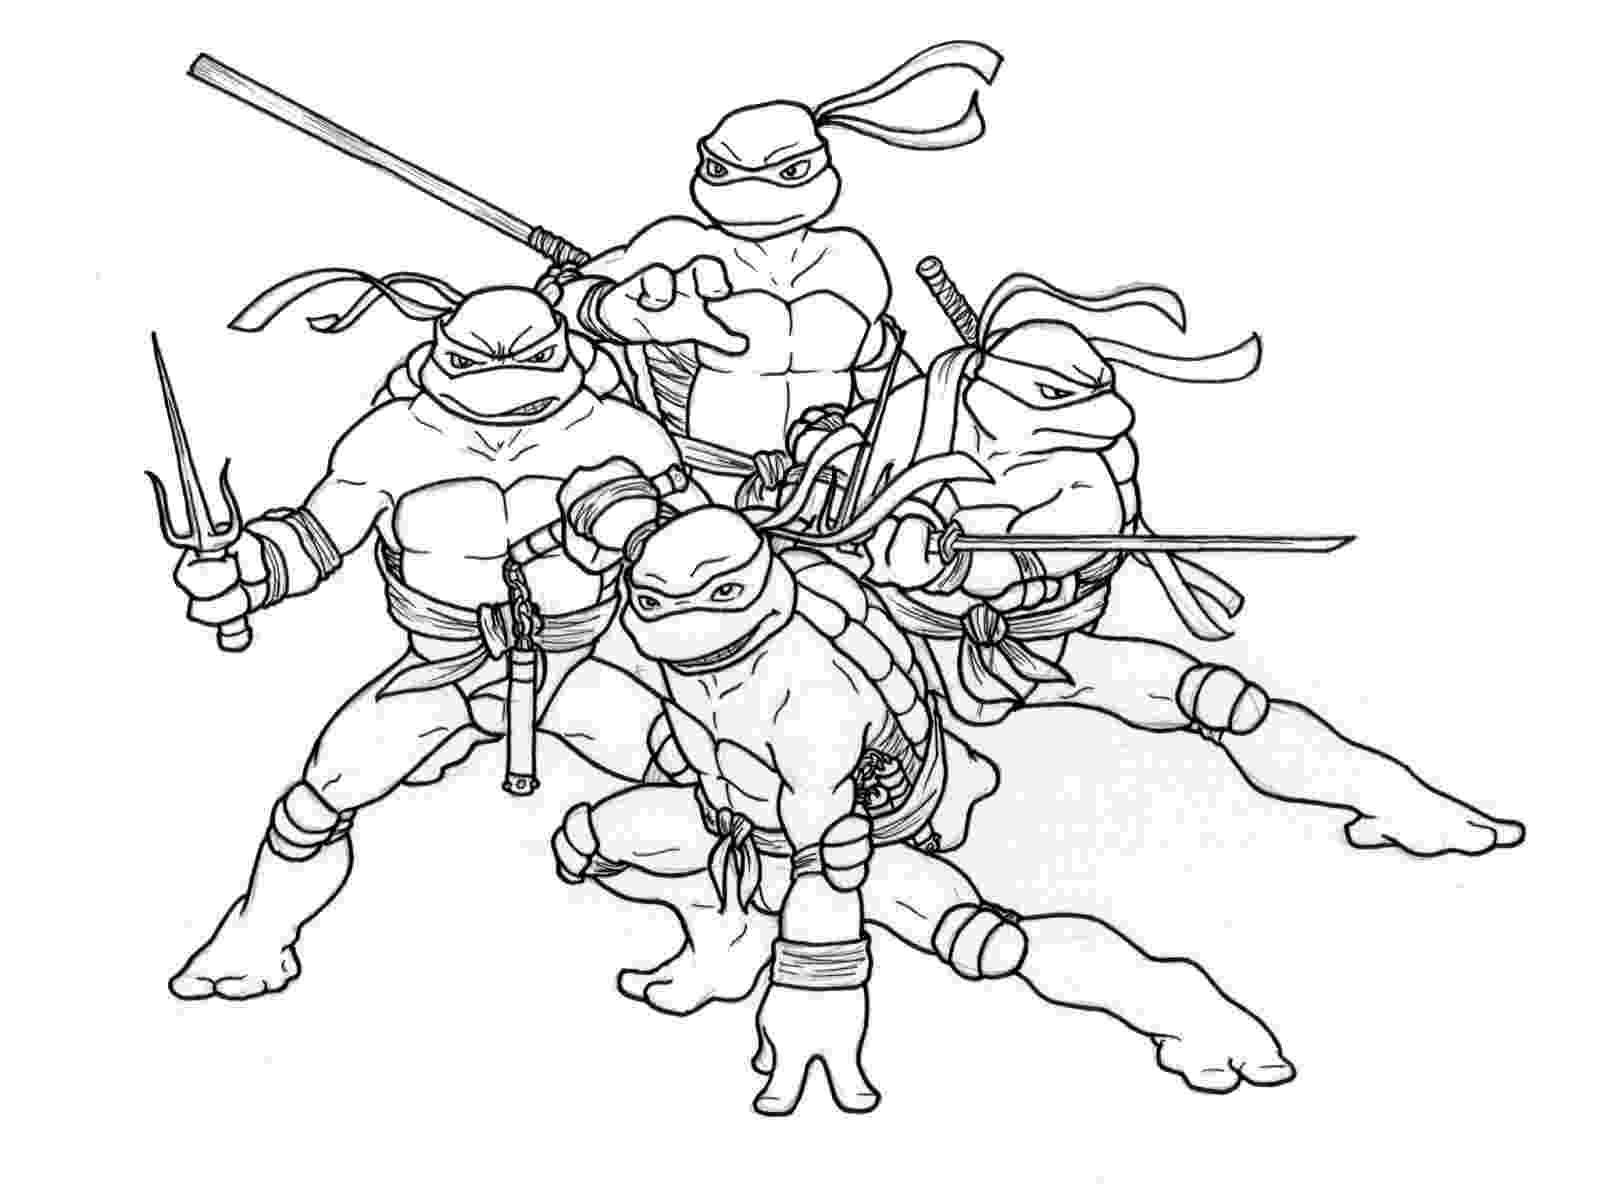 free ninja turtles coloring pages teenage mutant ninja turtles coloring pages best turtles pages free coloring ninja